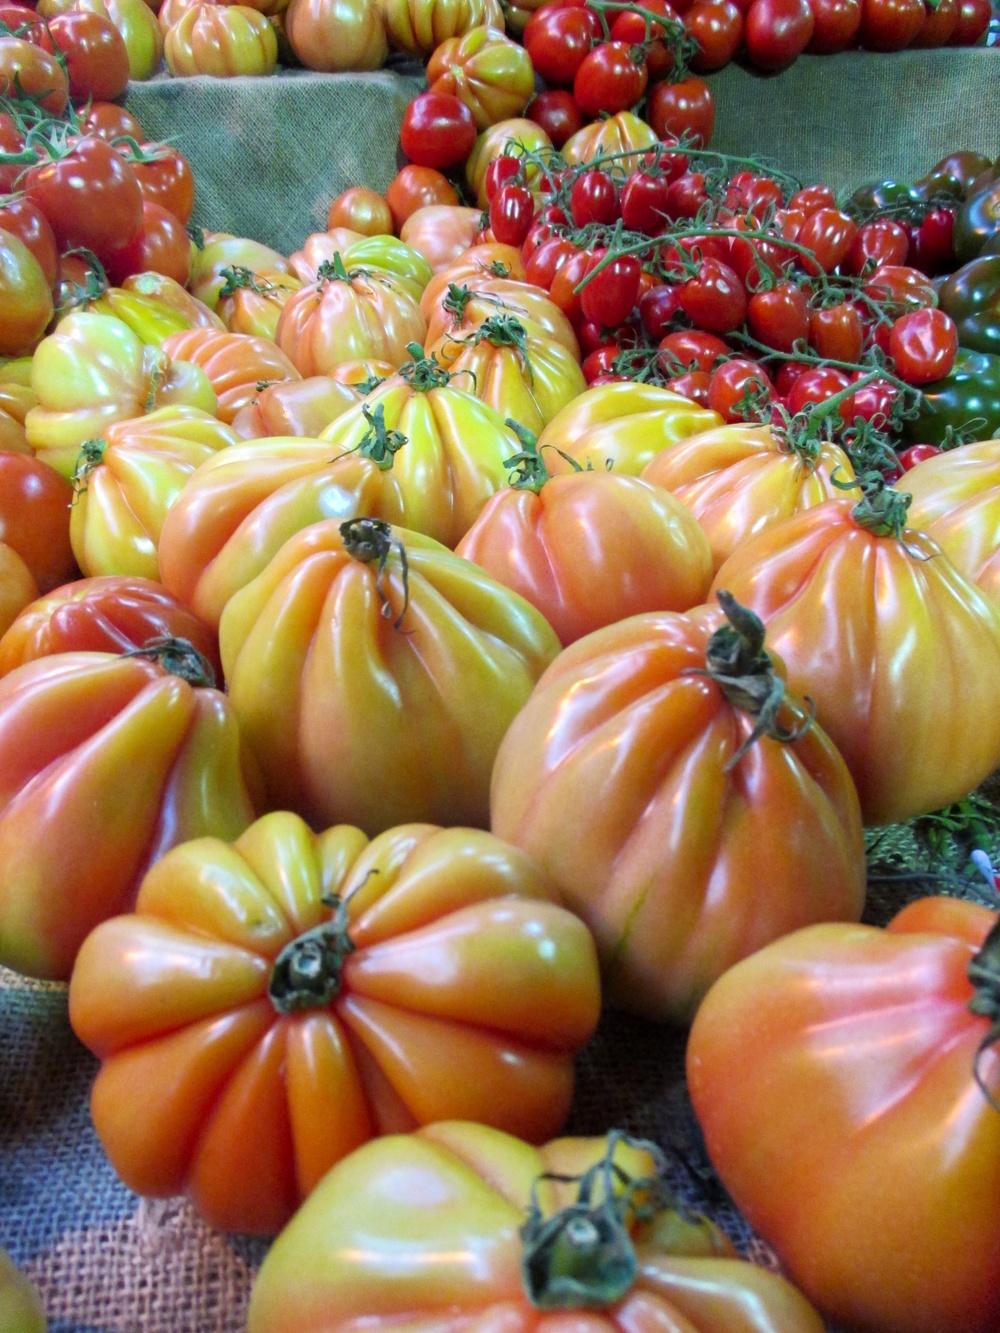 The breathtaking heirloom tomato display at London's Borough Market